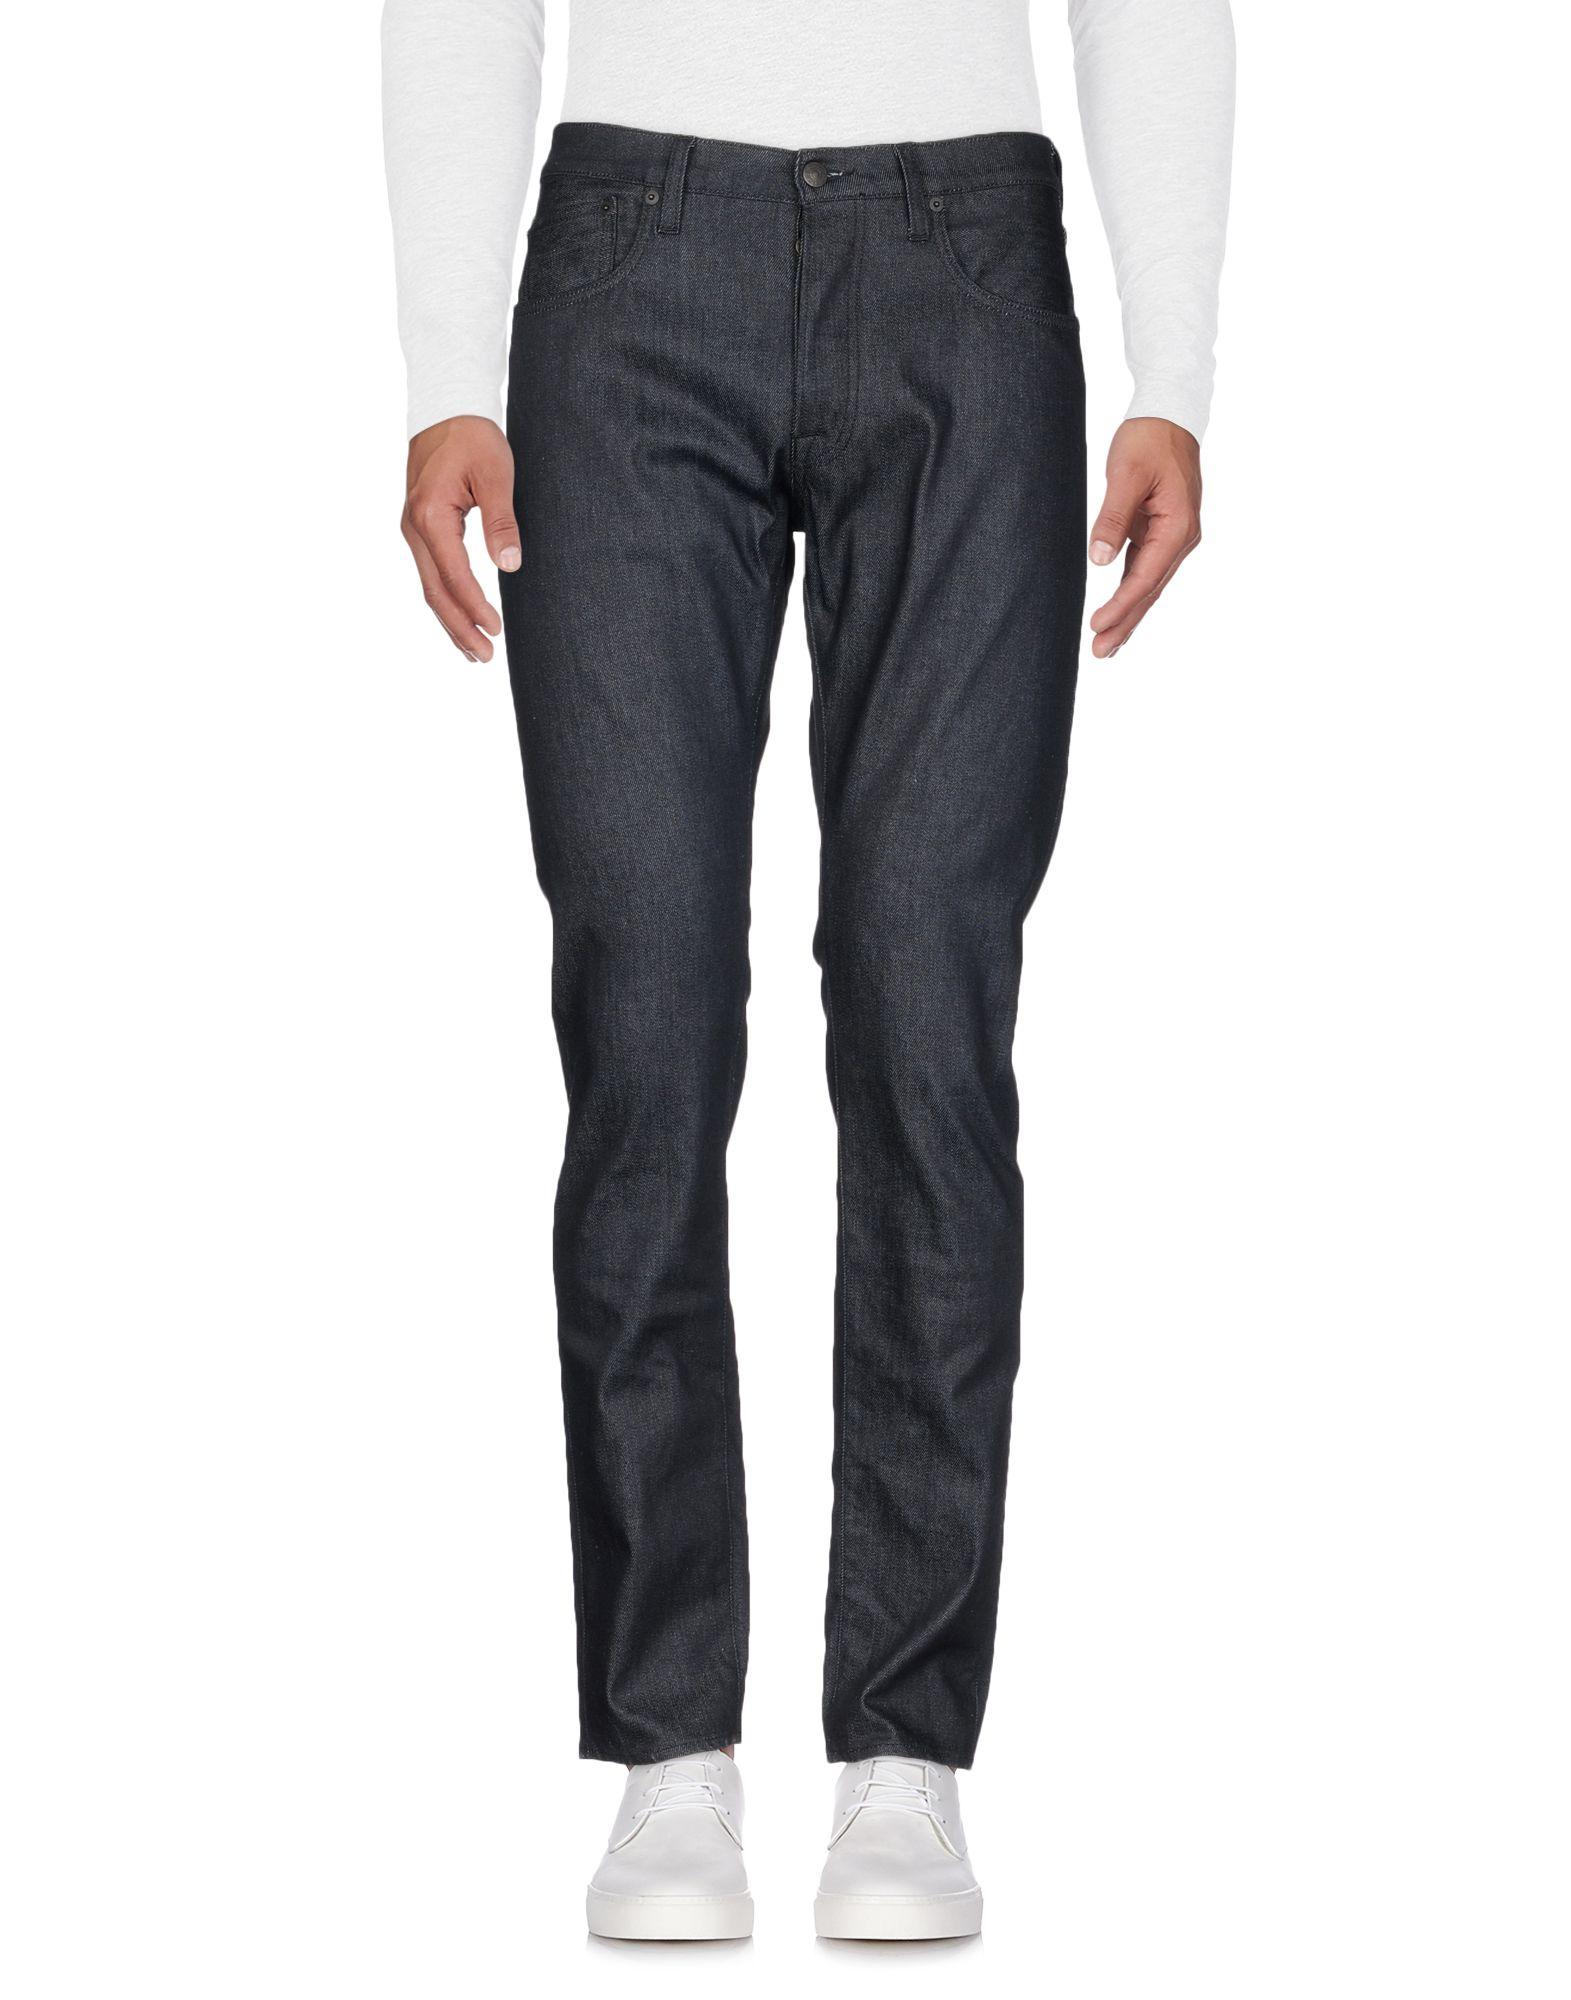 Pantaloni Jeans (+) People People (+) Uomo - 42683155LB a248c3